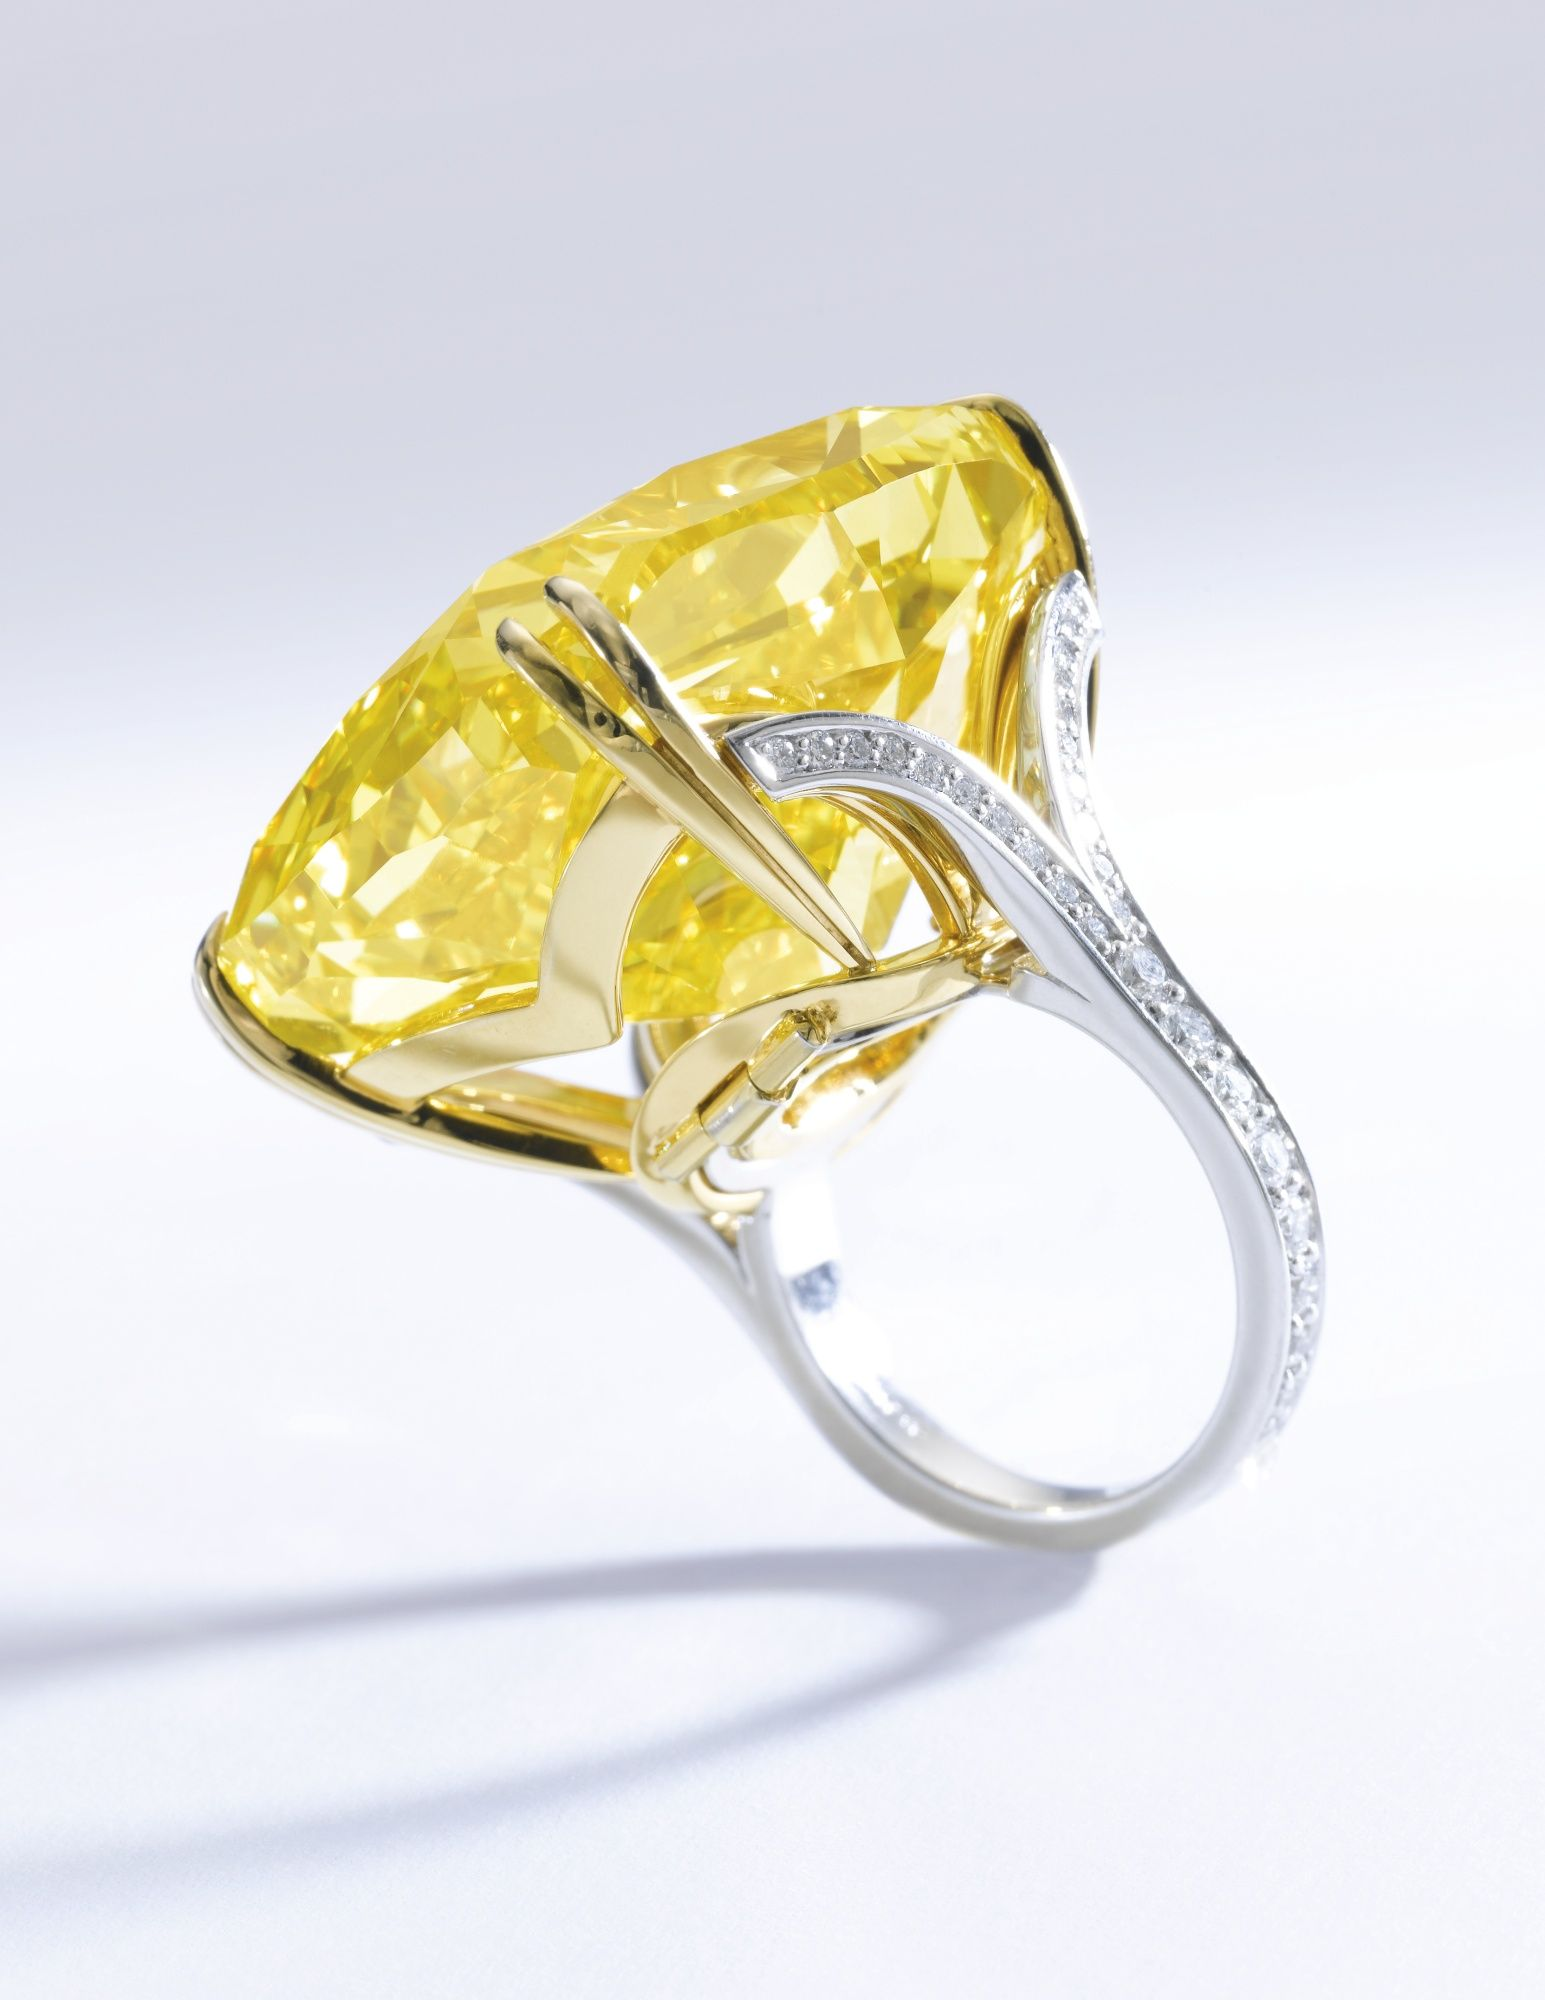 SENSATIONAL AND RARE FANCY VIVID YELLOW DIAMOND RING ...